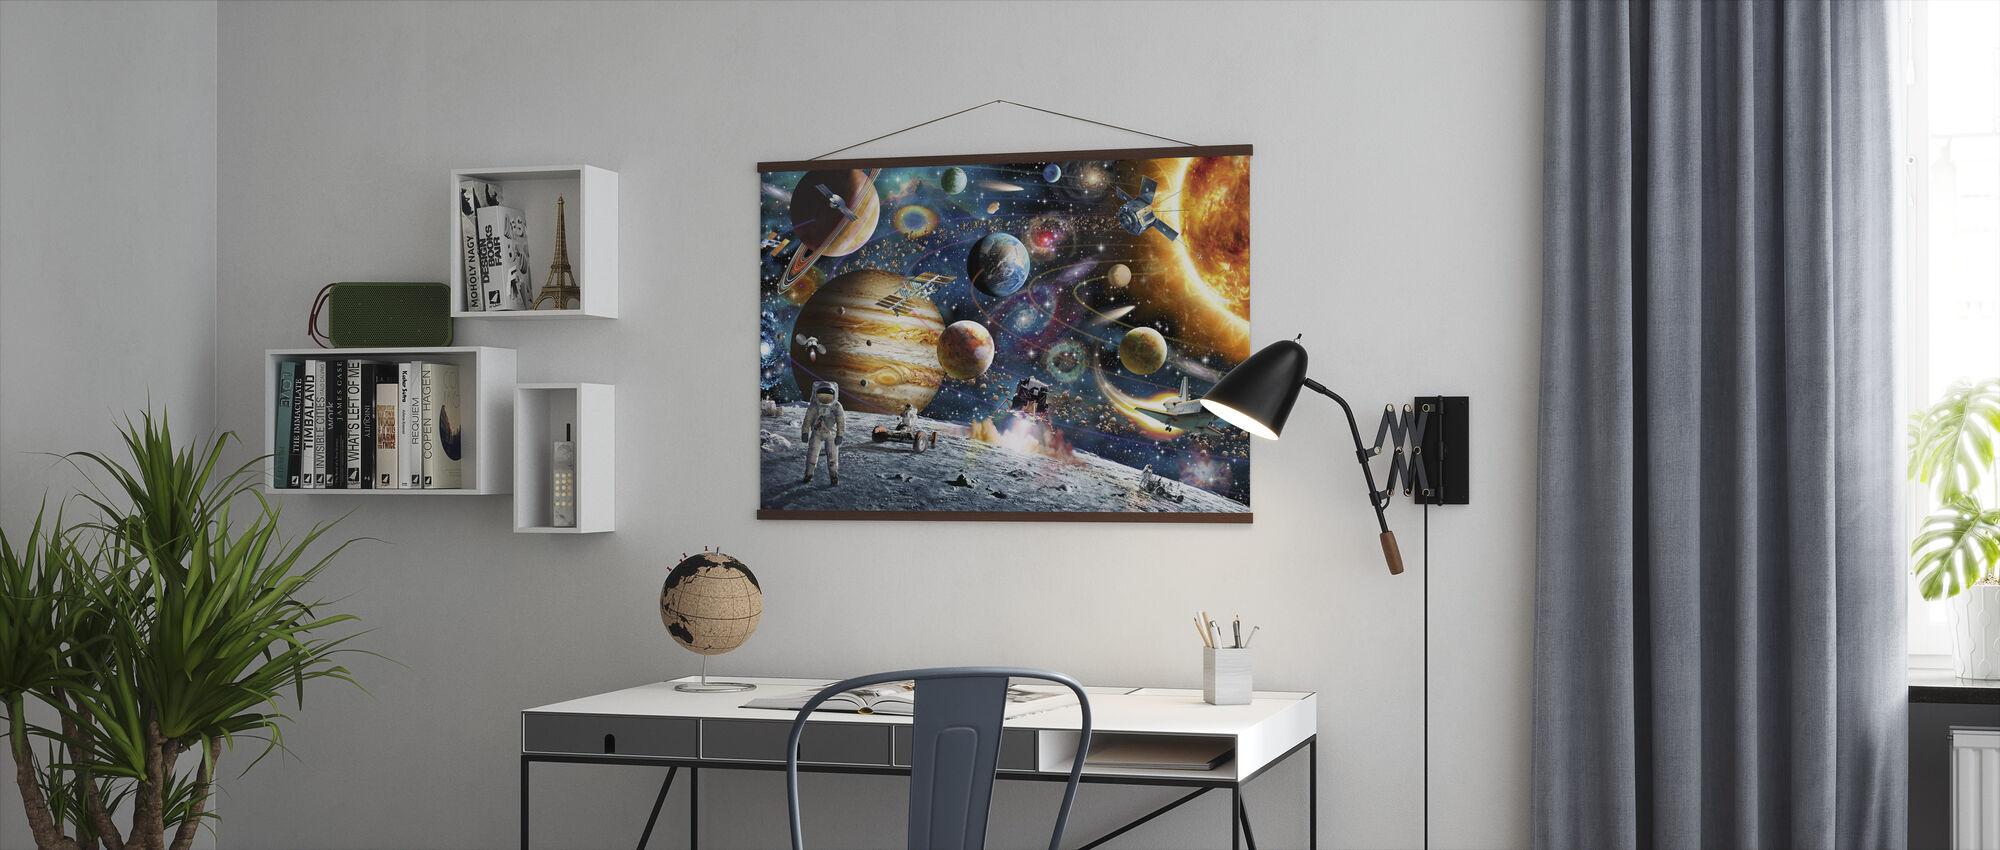 Rymd Odysséen - Poster - Kontor